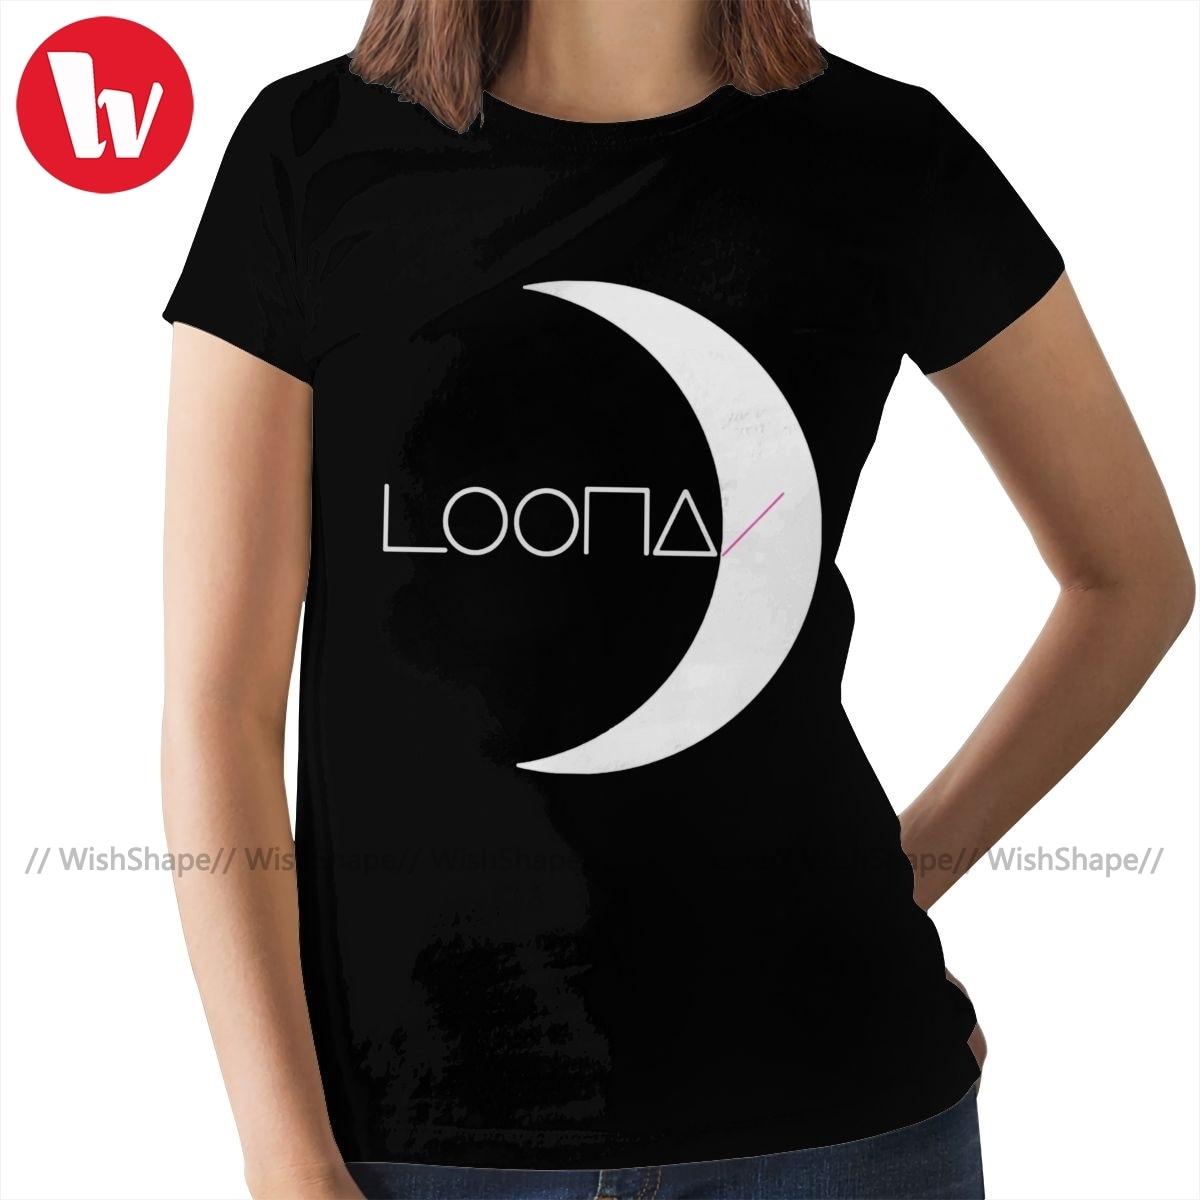 Loona kpop camiseta kpop girlgroup loona logo t camisa roupas de rua oversize feminino tshirt o pescoço das senhoras camiseta